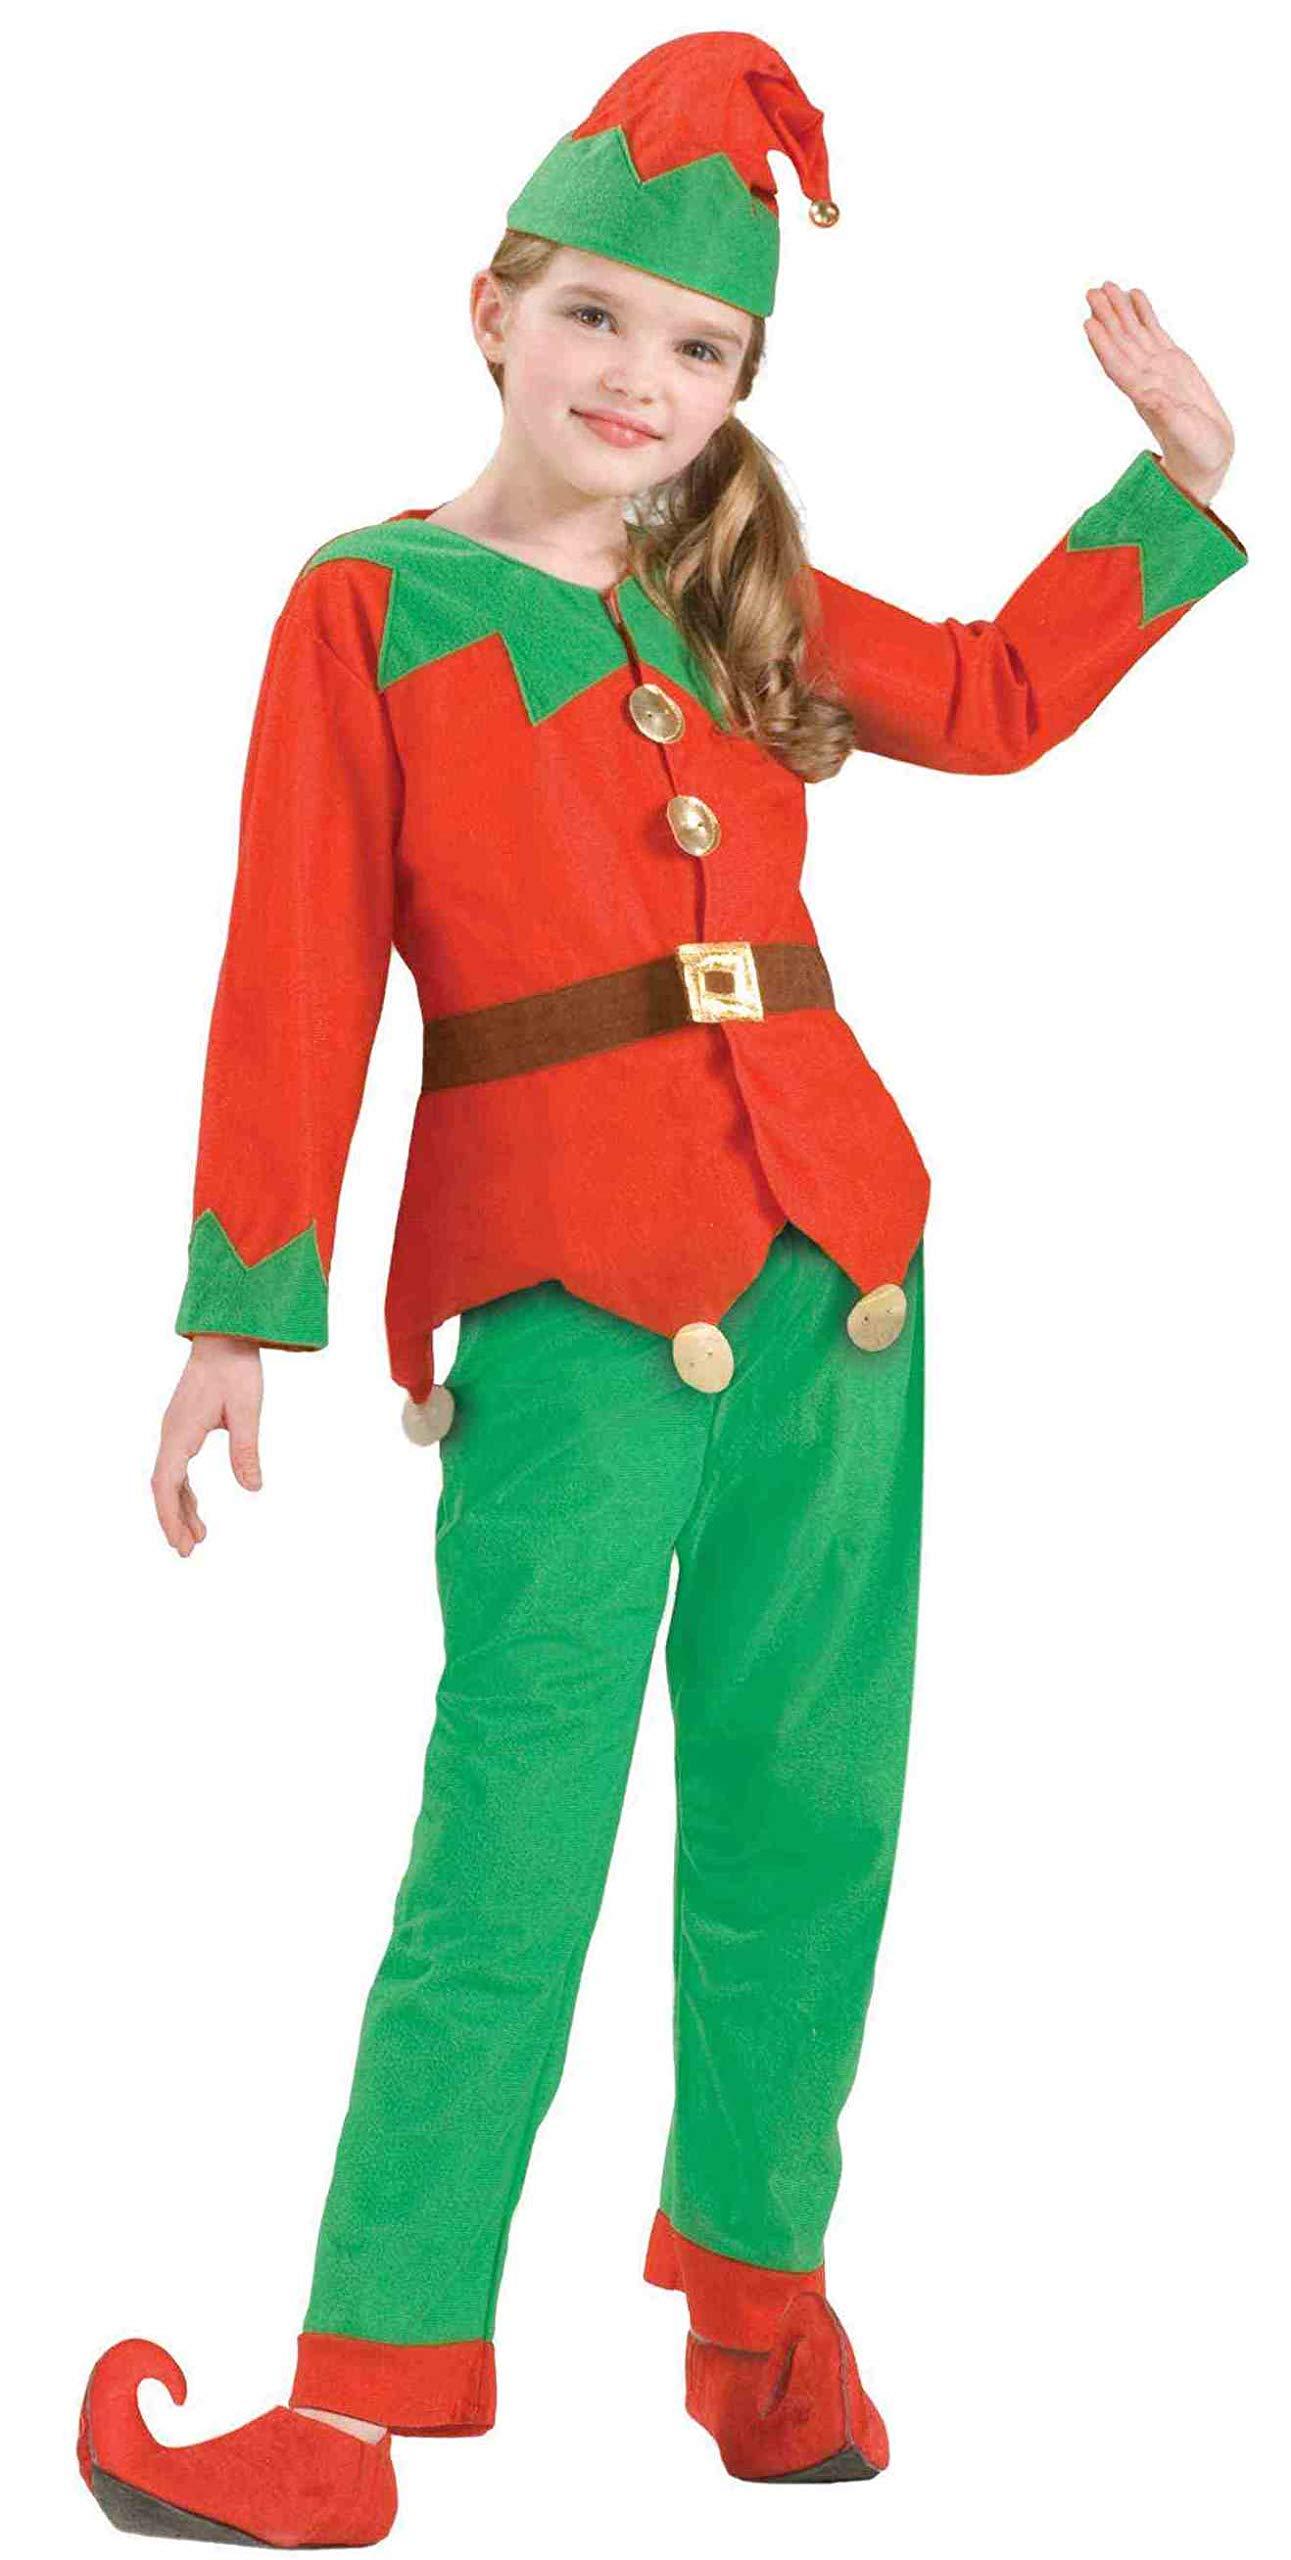 1c1800efea Amazon.com  Forum Novelties Children s Simply Elf Costume  Toys   Games